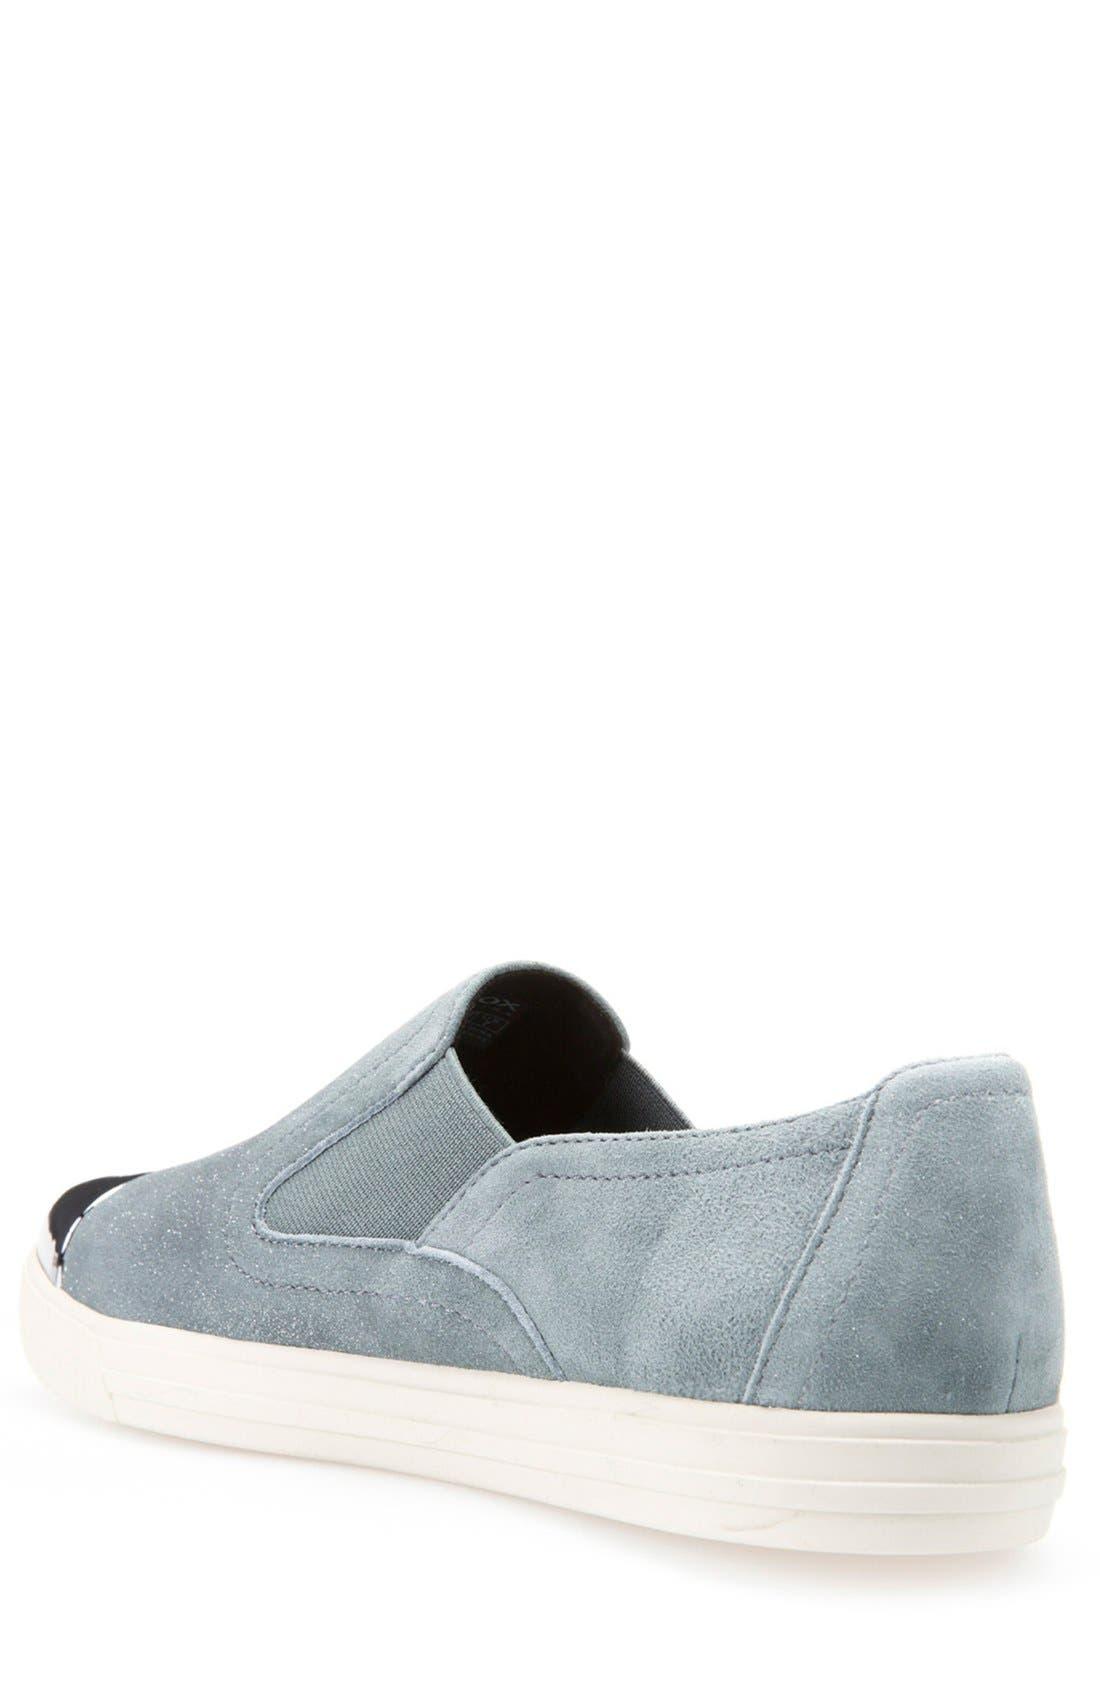 Alternate Image 2  - Geox 'Amalthia' Cap Toe Sneaker (Women)